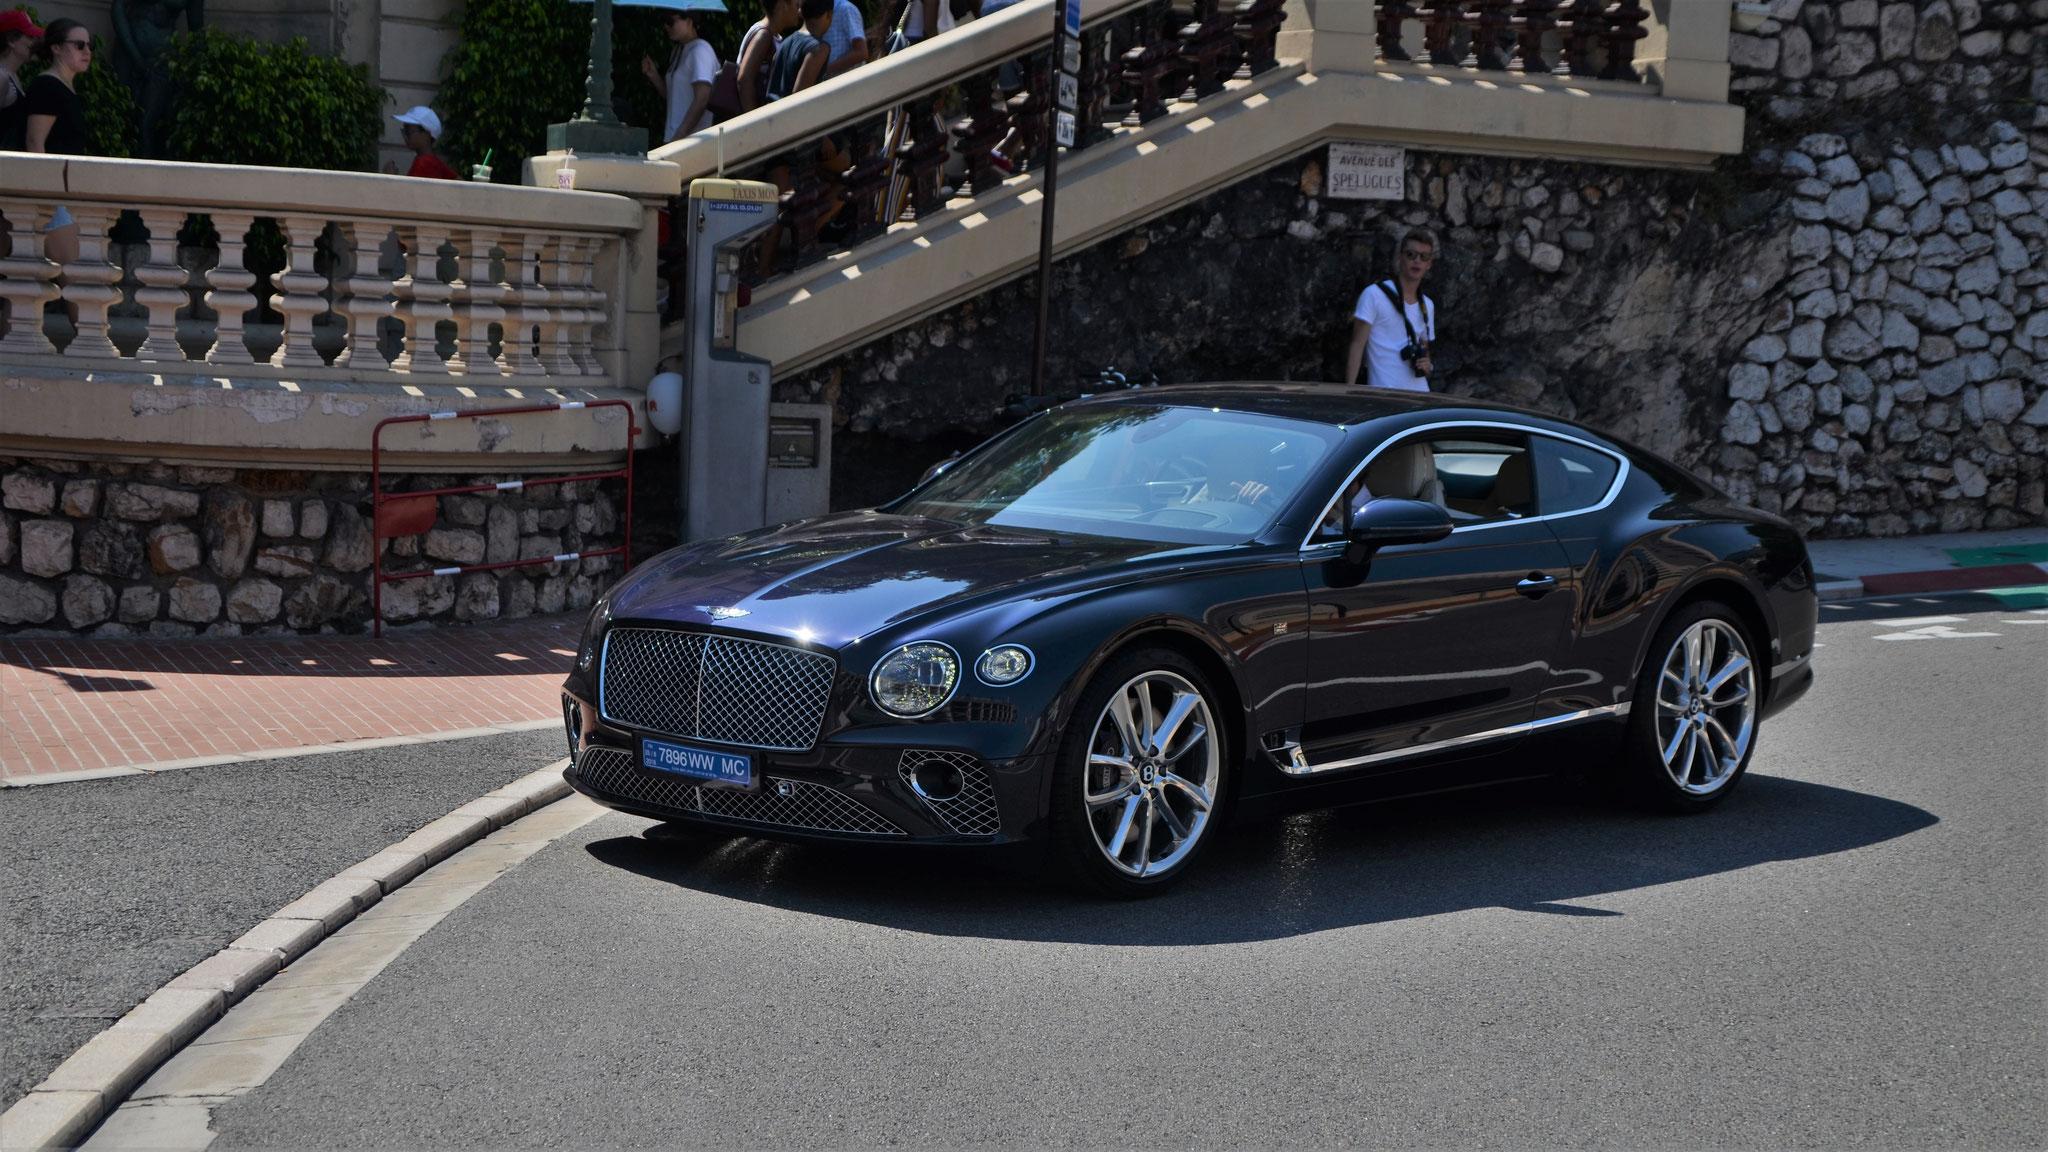 Bentley Continental GT - 7896-WW-MC (MC)